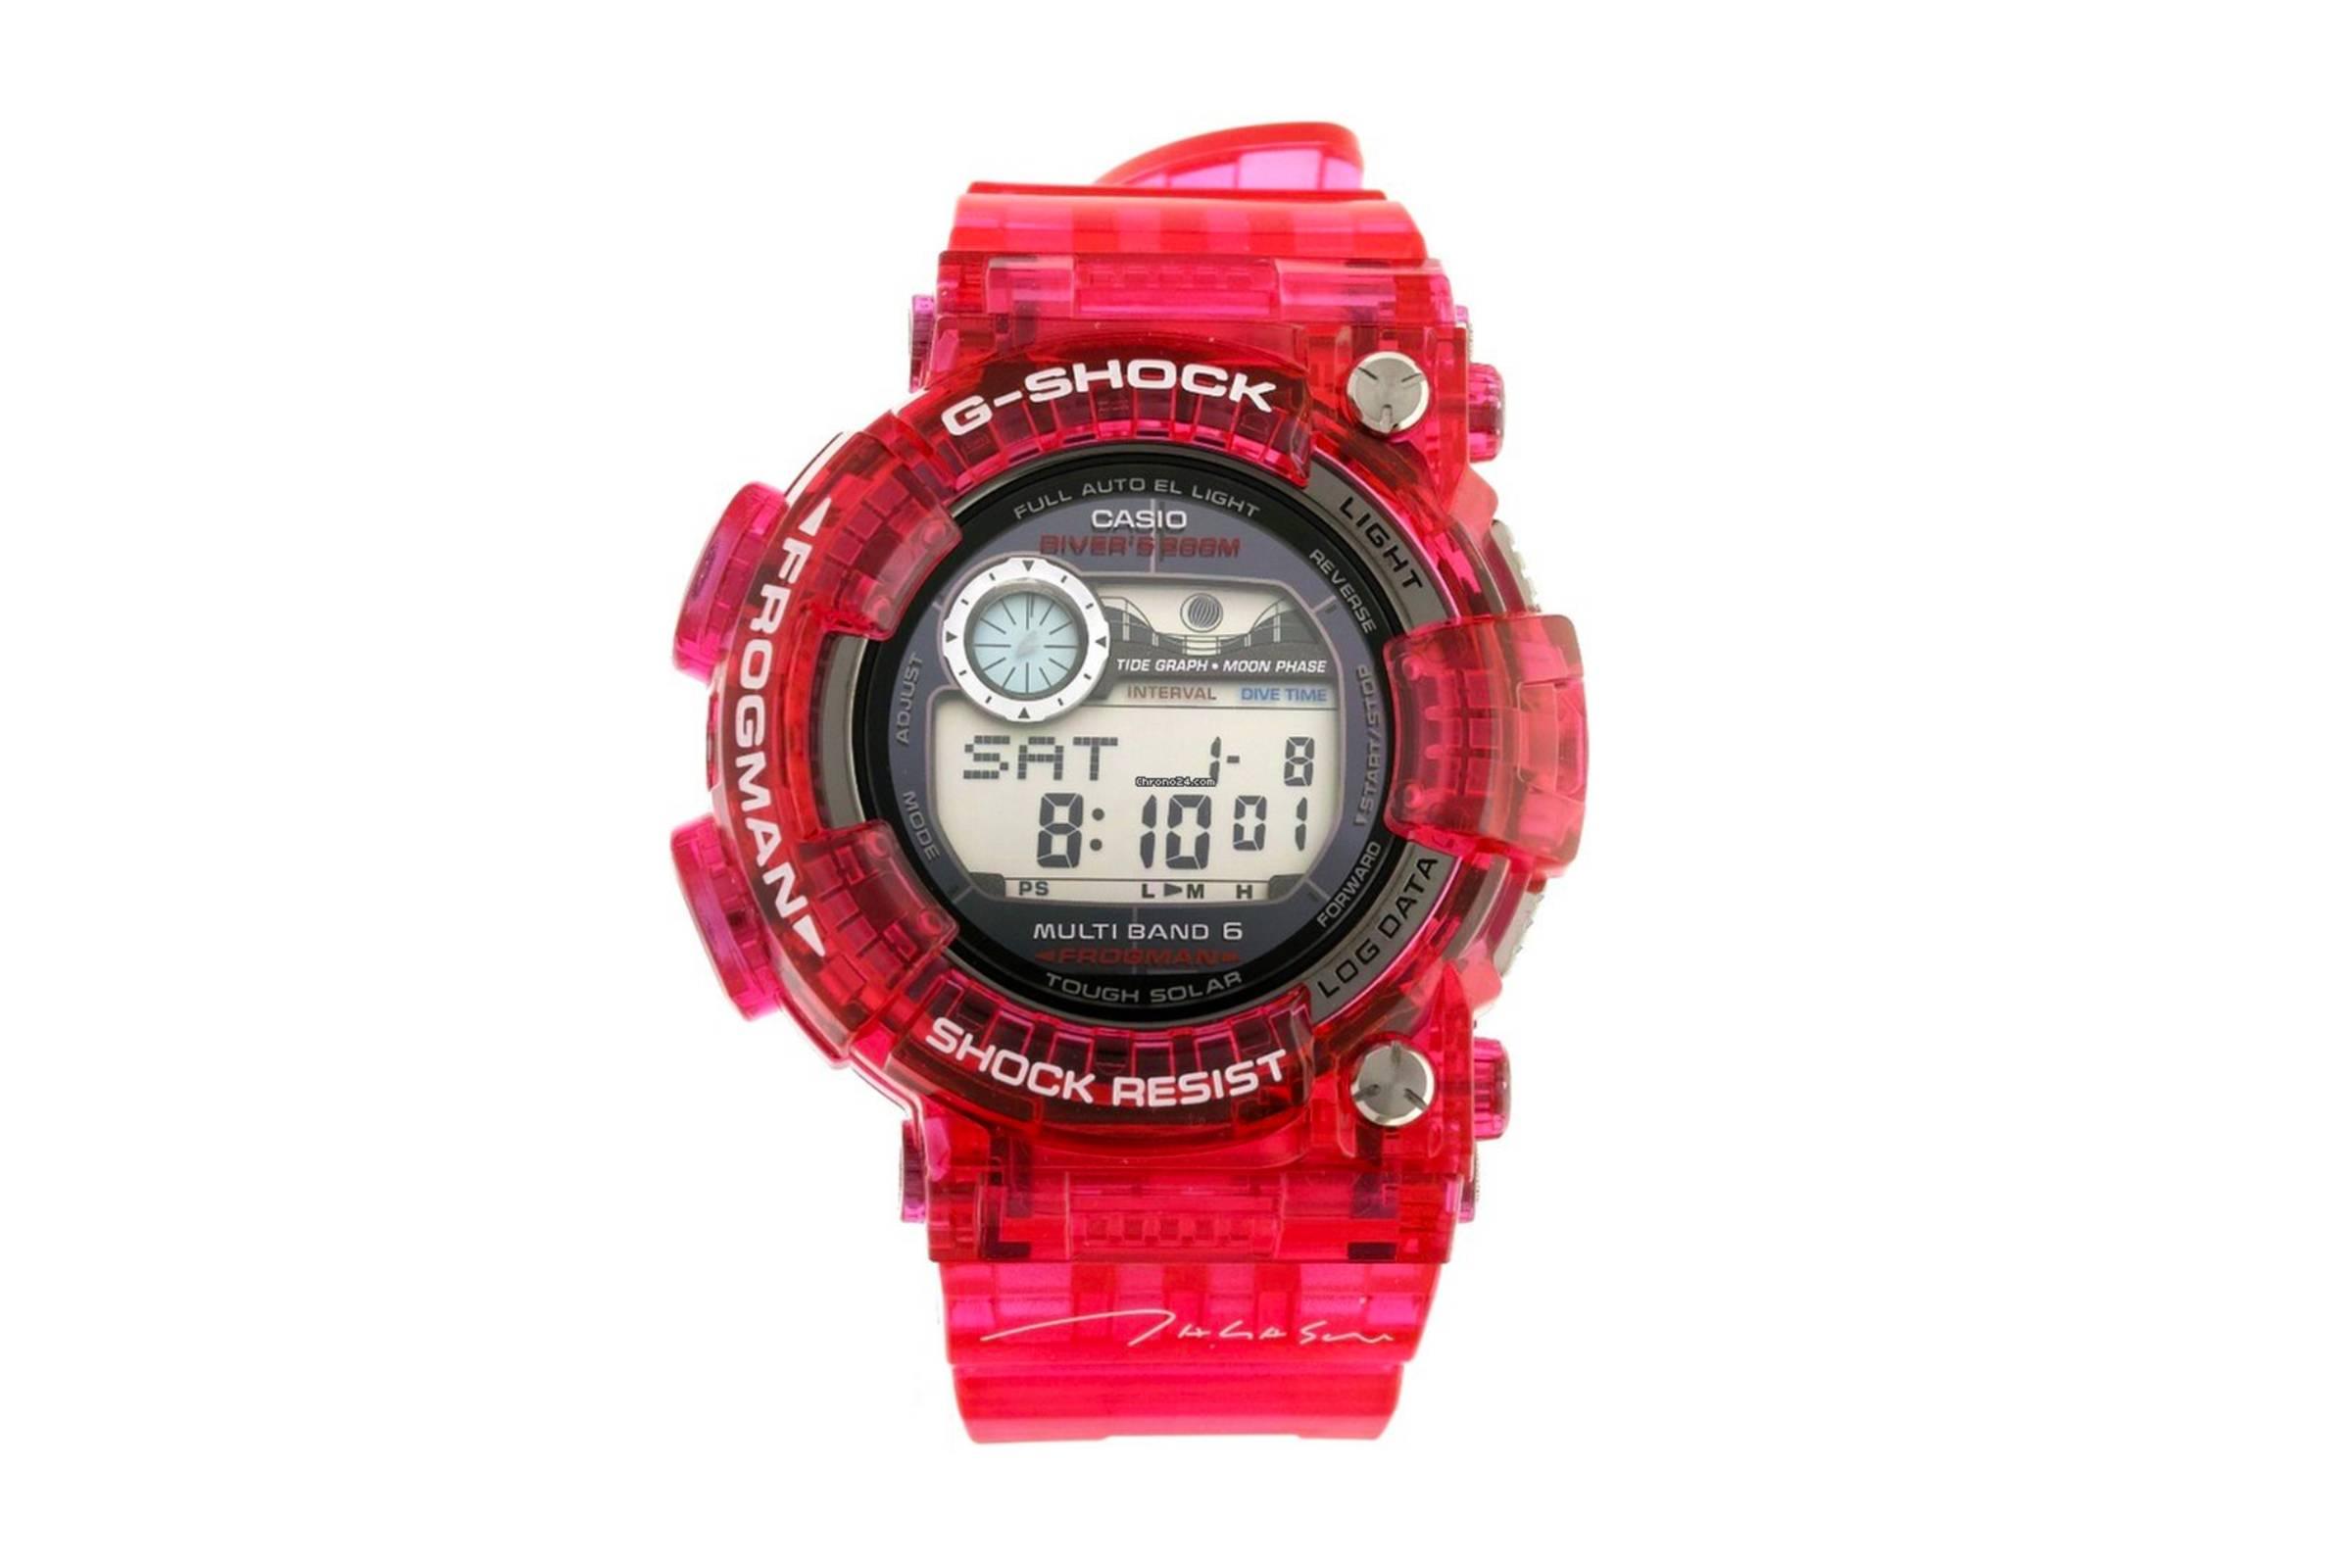 Takashi Murakami x Casio G-Shock Frogman GWF-1000TM-4JR